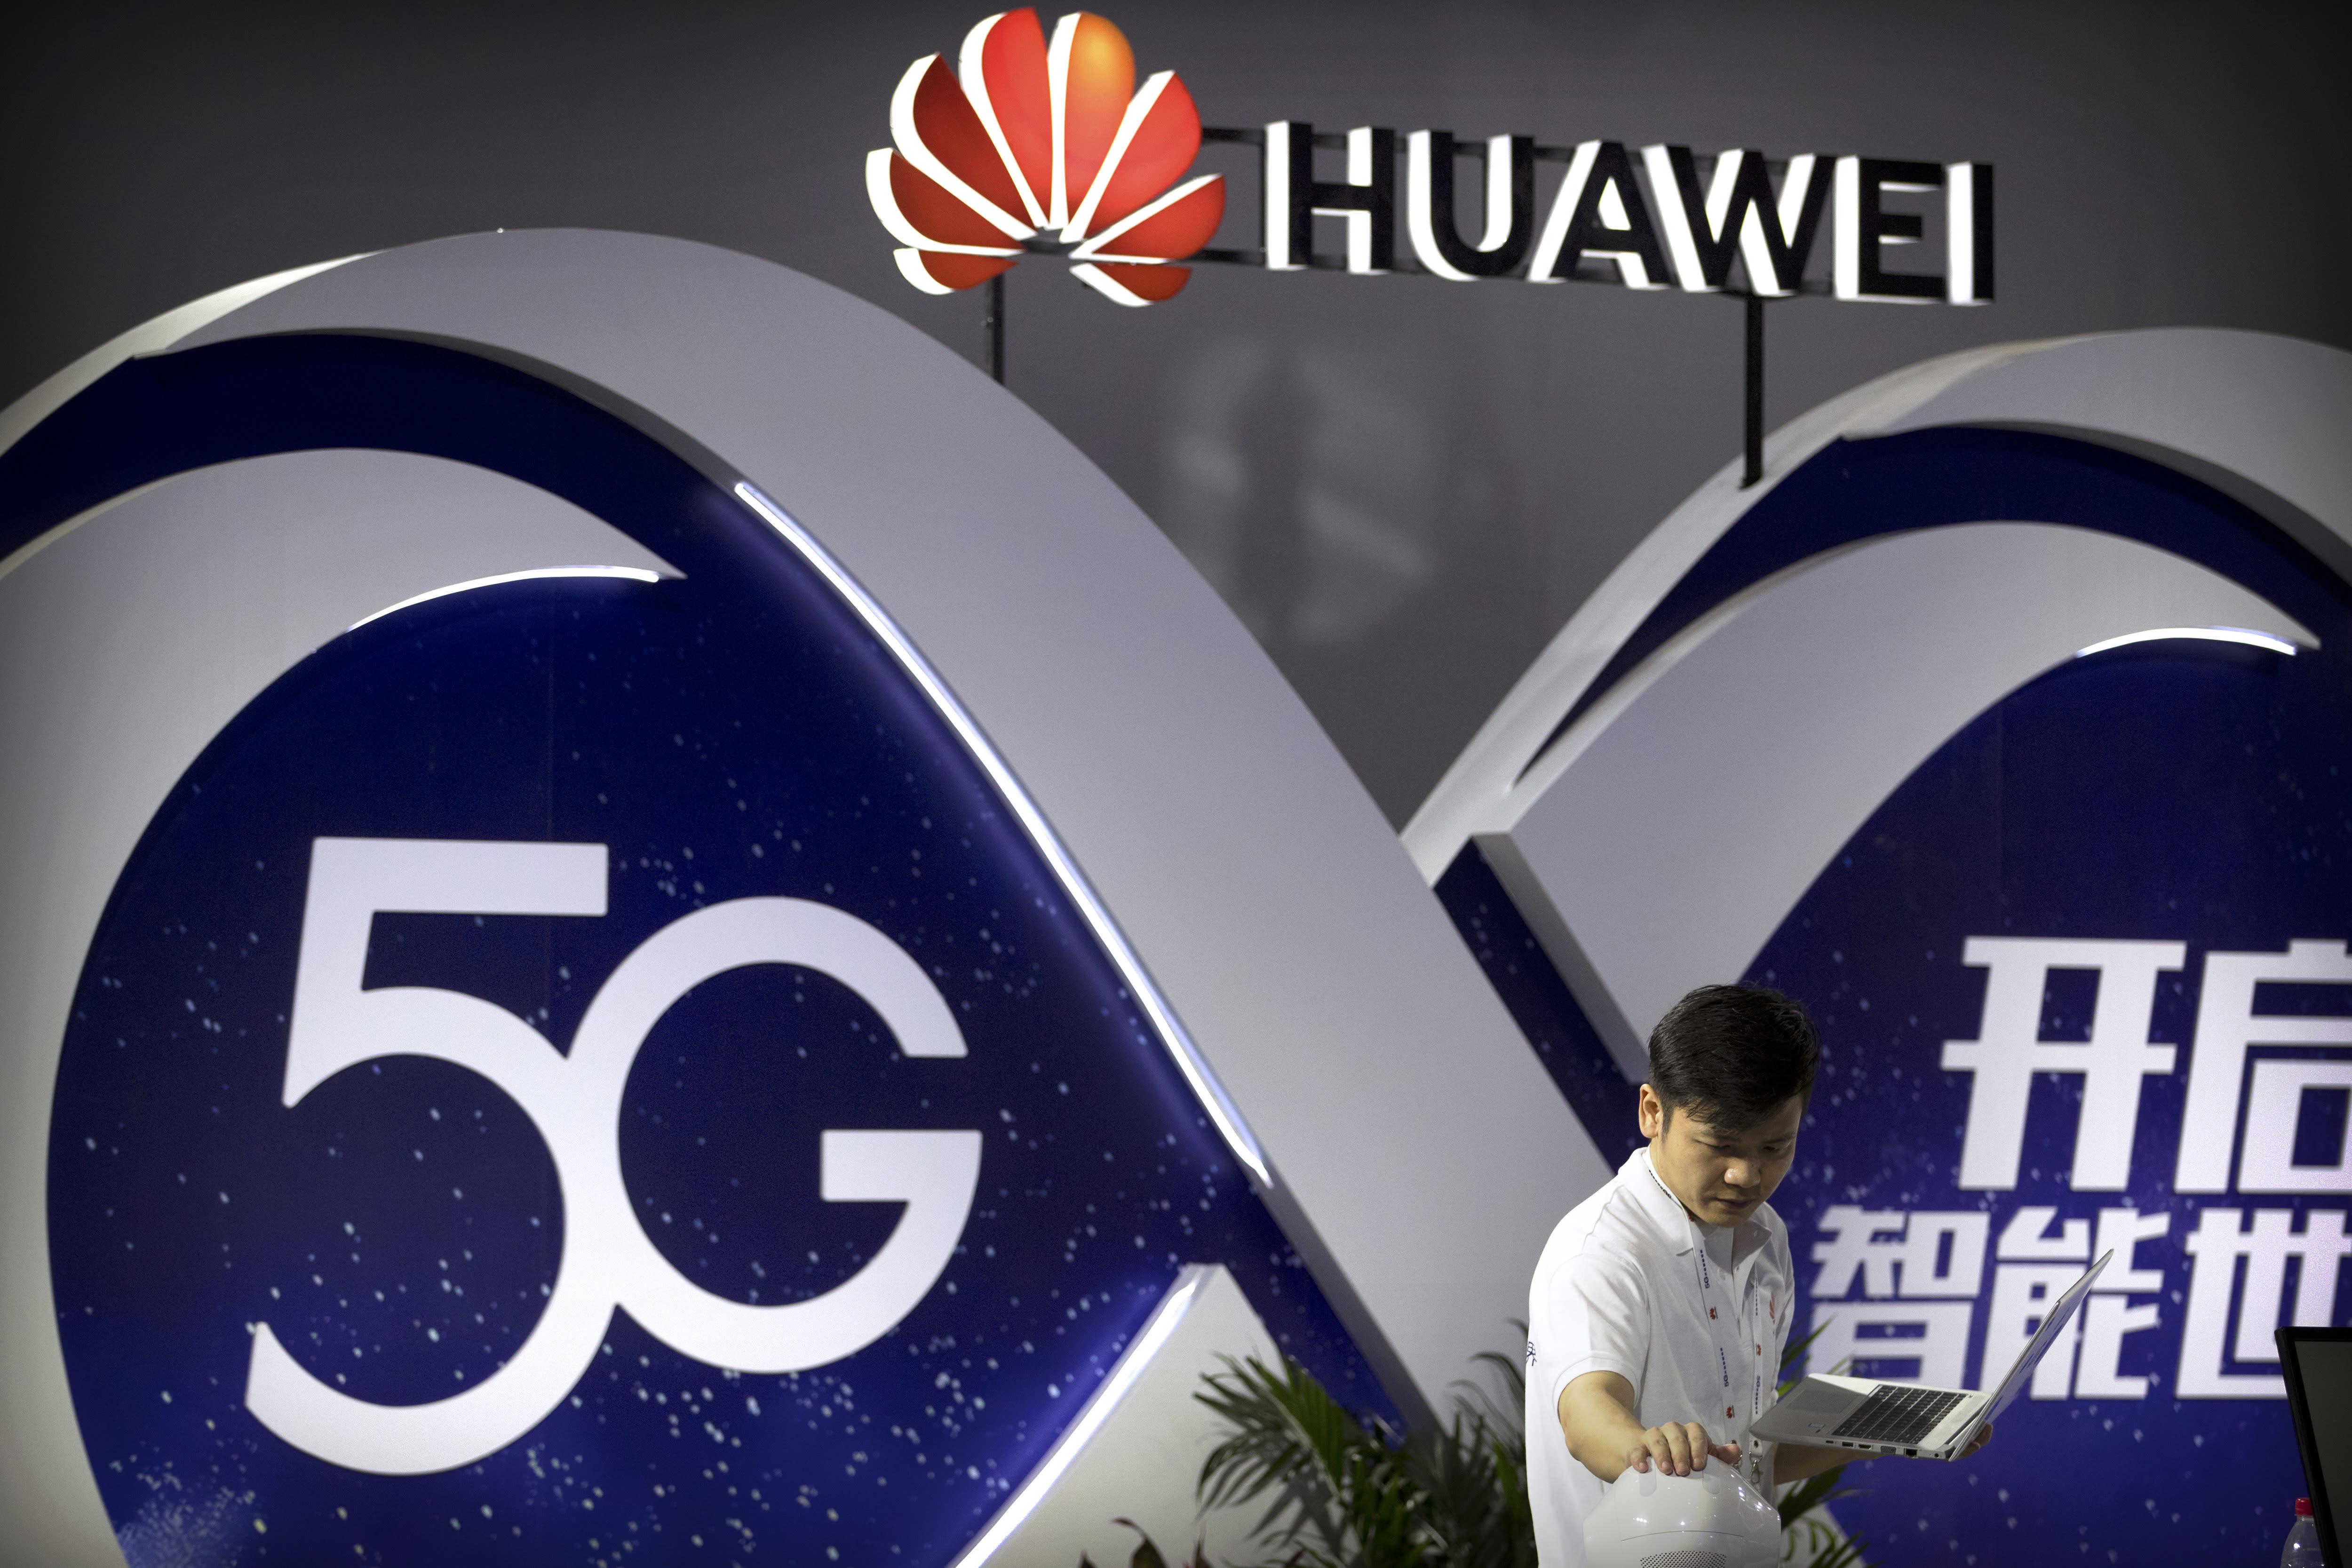 China wins when US focuses on short-term profits: telecom mogul